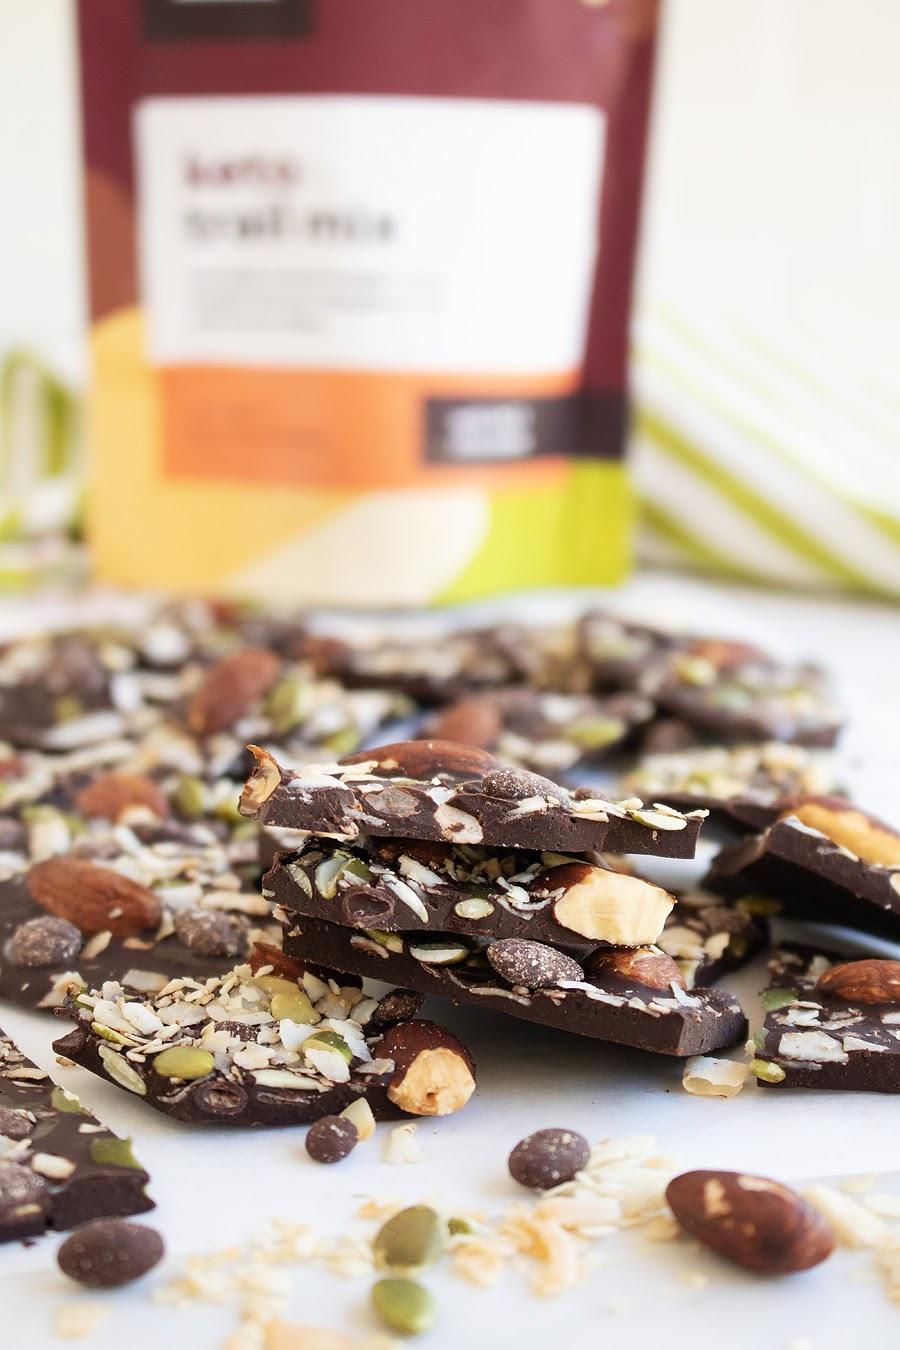 Receta de corteza de chocolate negro con mezcla de frutos secos